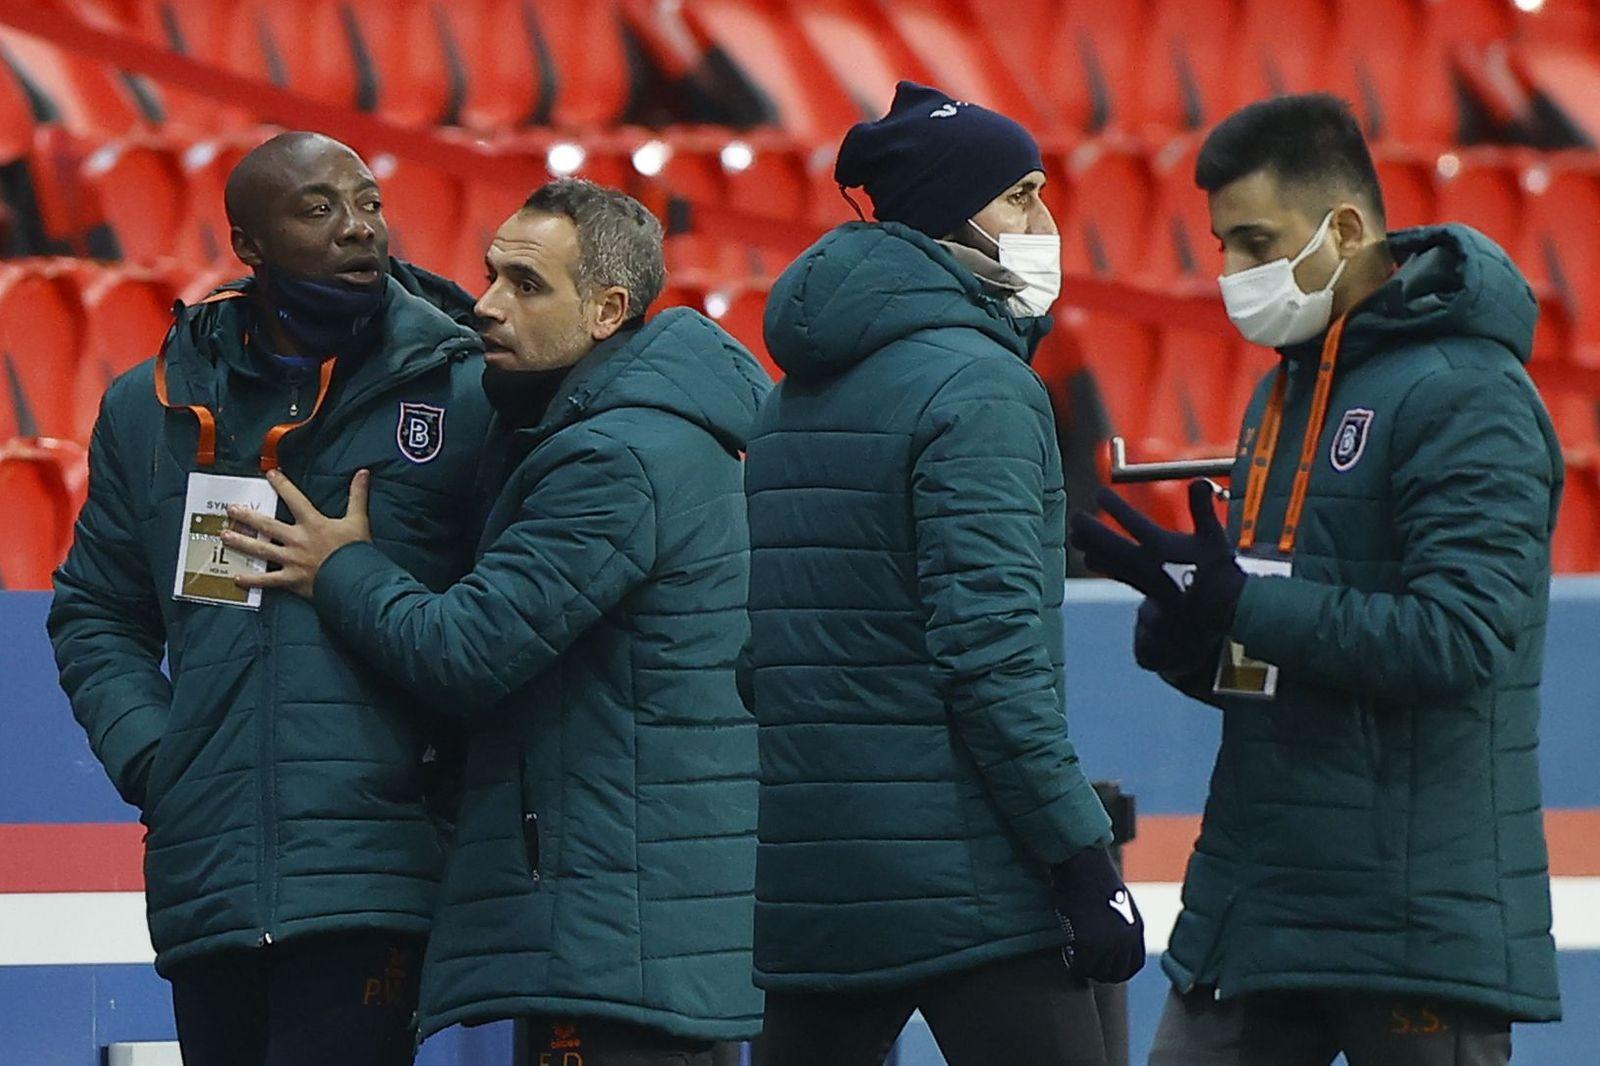 Paris Saint-Germain vs Istanbul Basaksehir, France - 08 Dec 2020